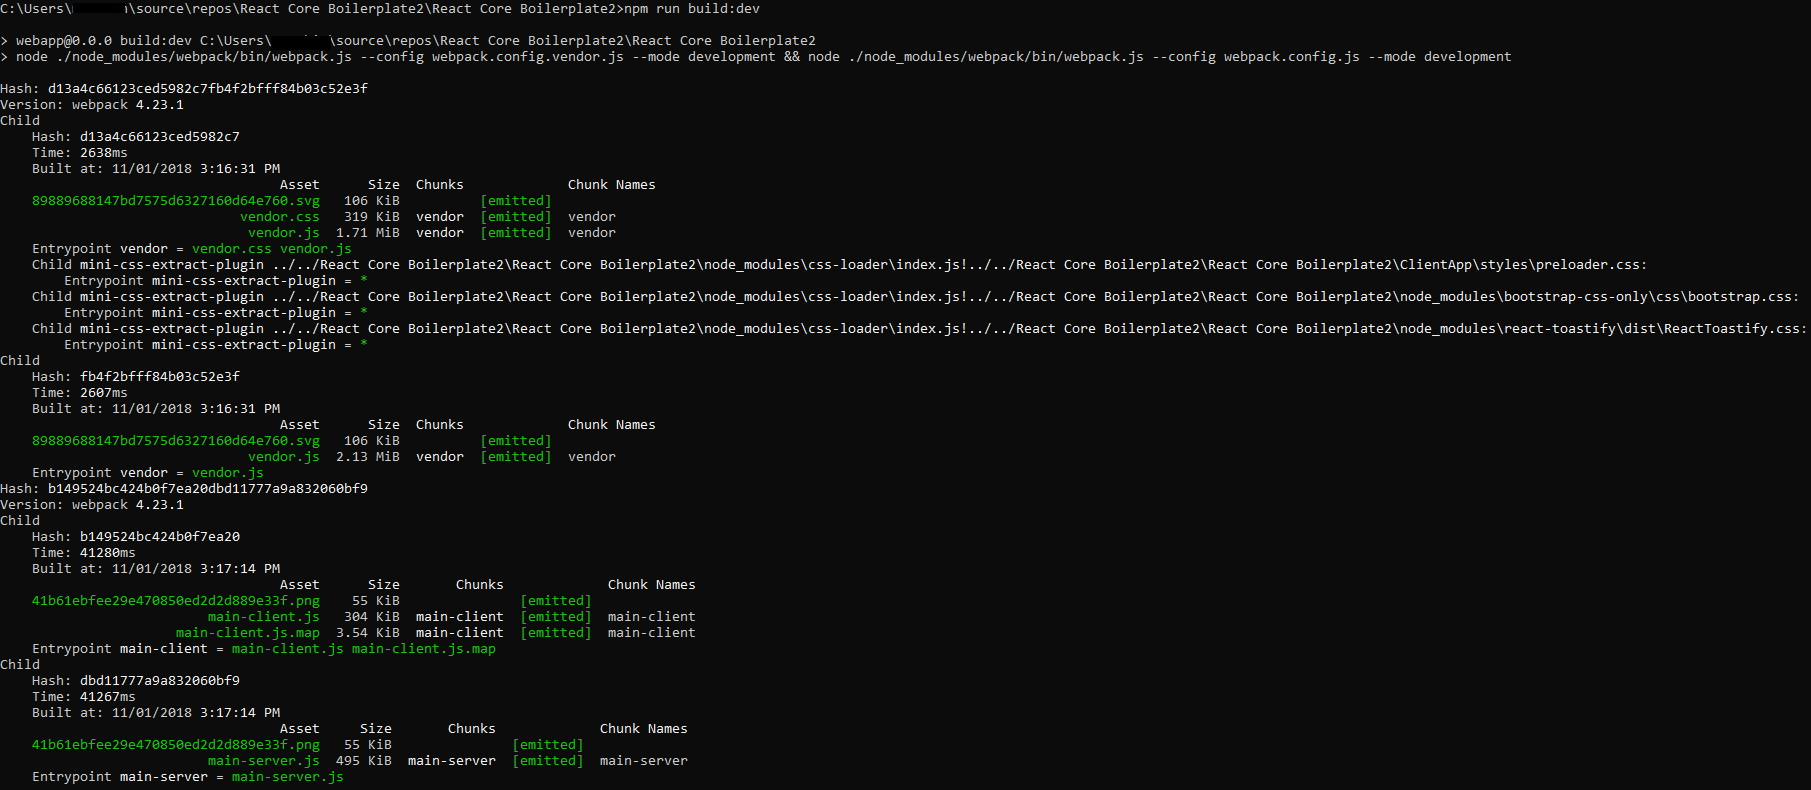 Add JavaScript files to React Core Boilerplate template